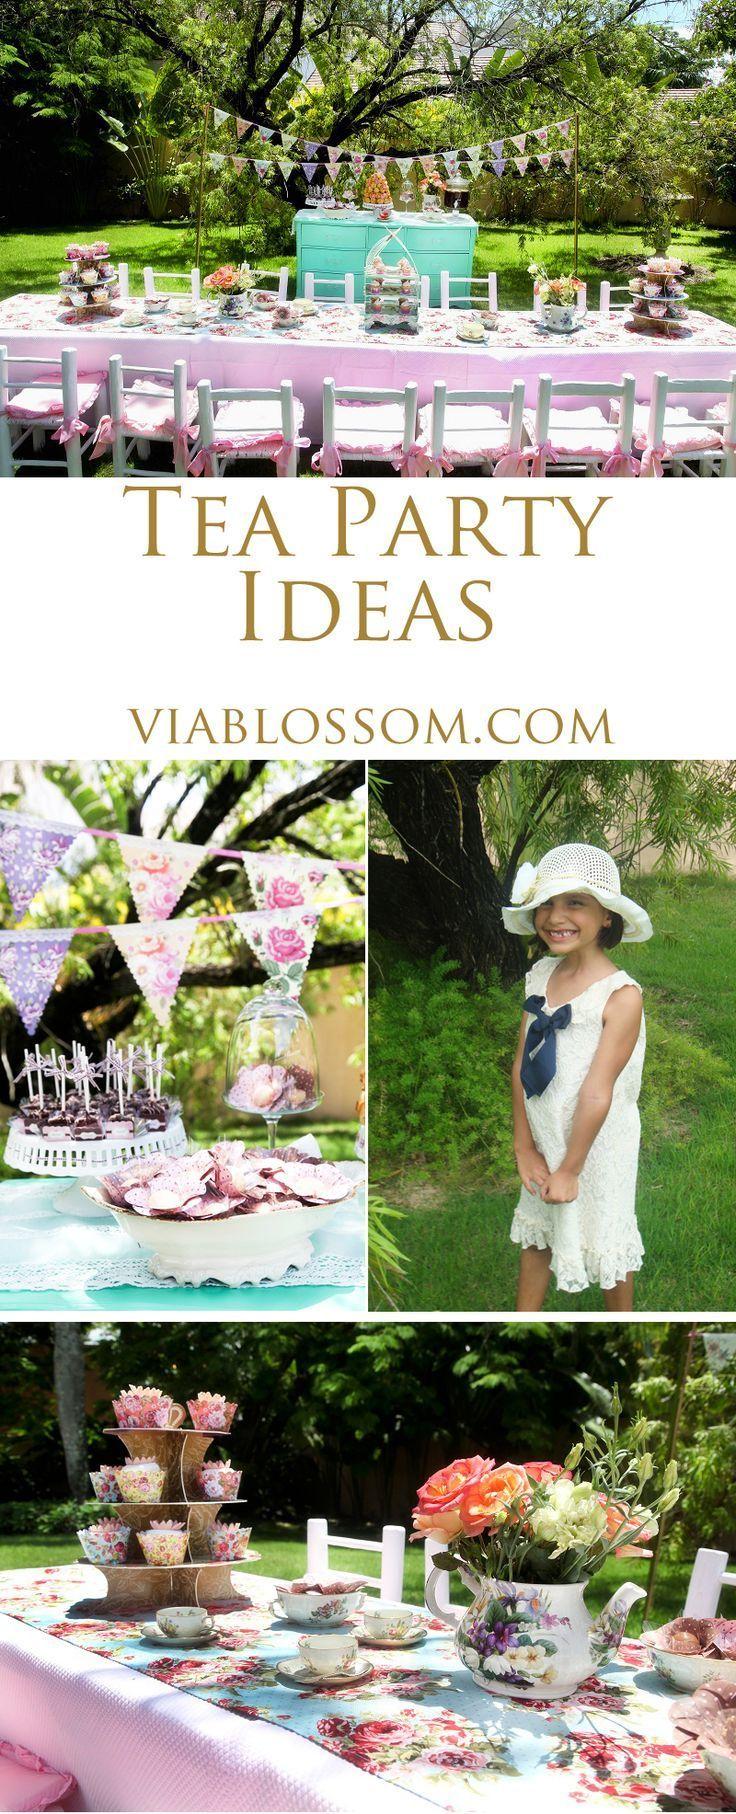 Best 25+ Tea party decorations ideas on Pinterest   Kitchen tea ...